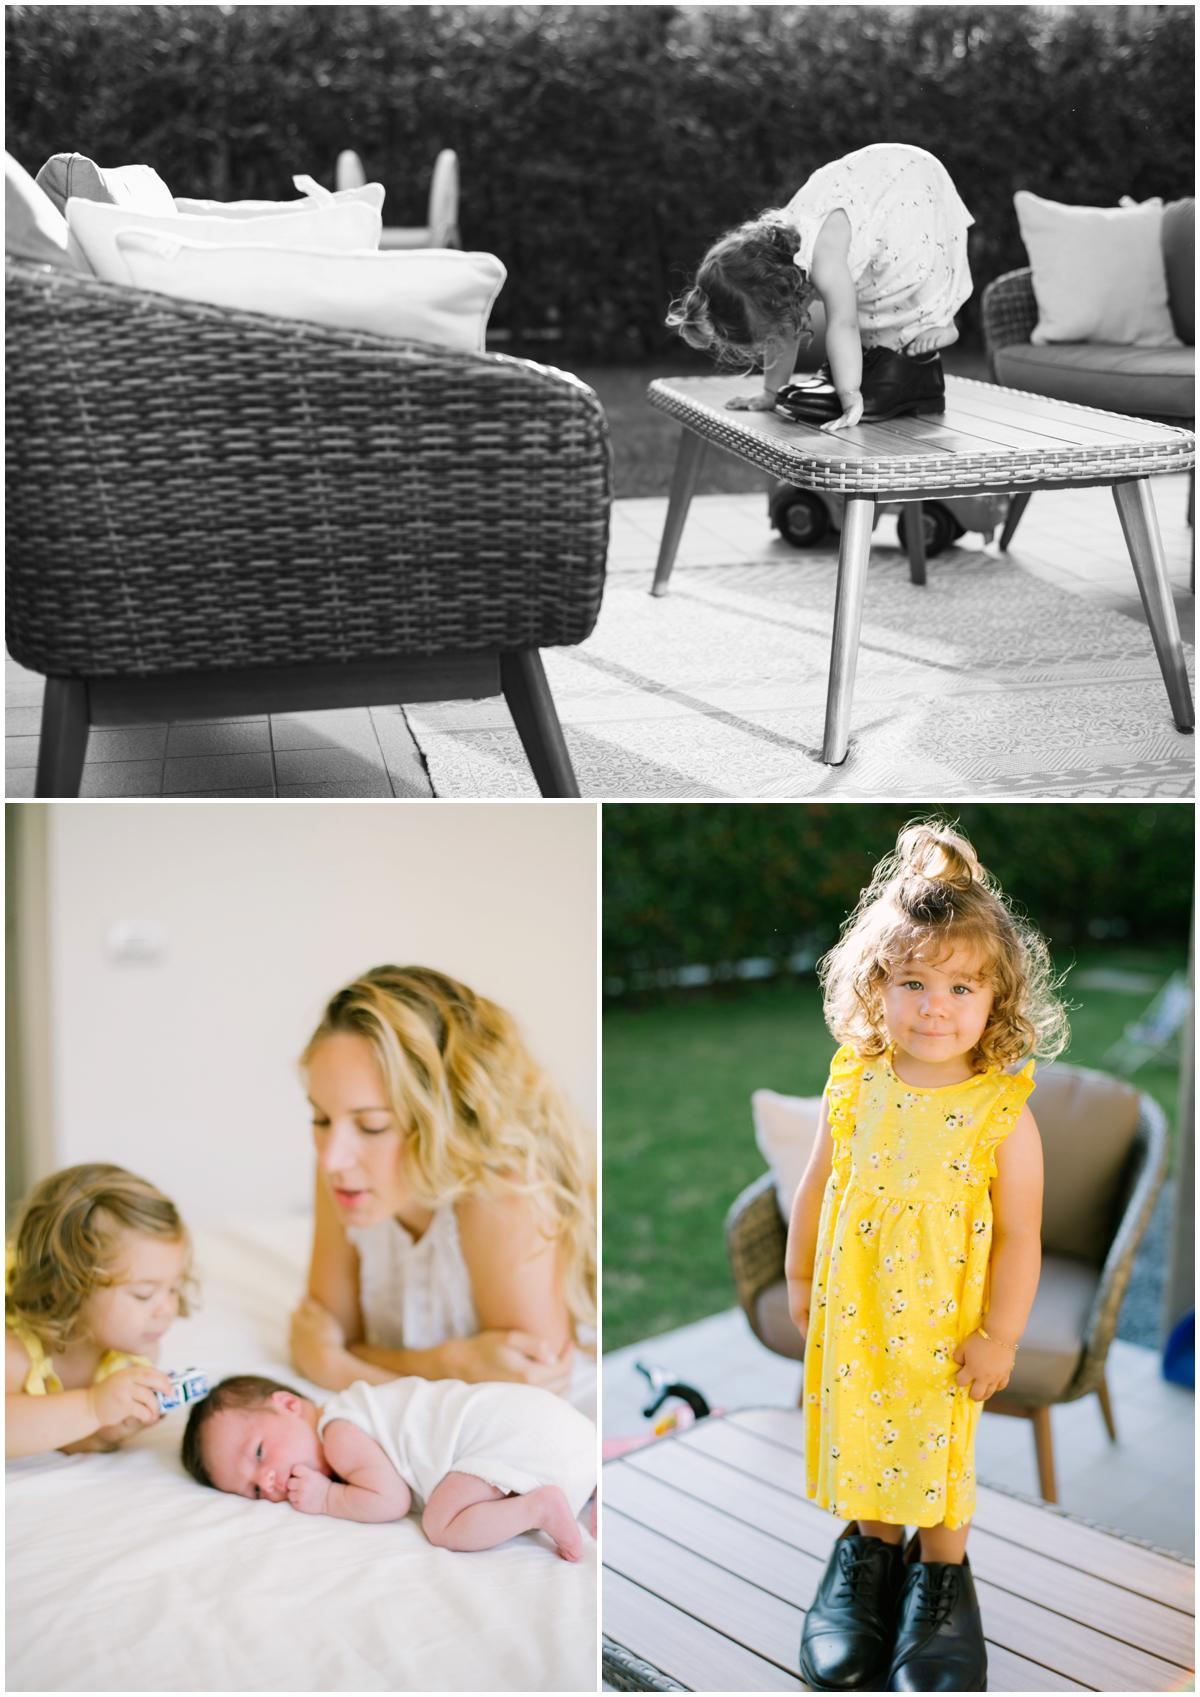 Alea+Lovely+Family+Portraits_0017.jpg